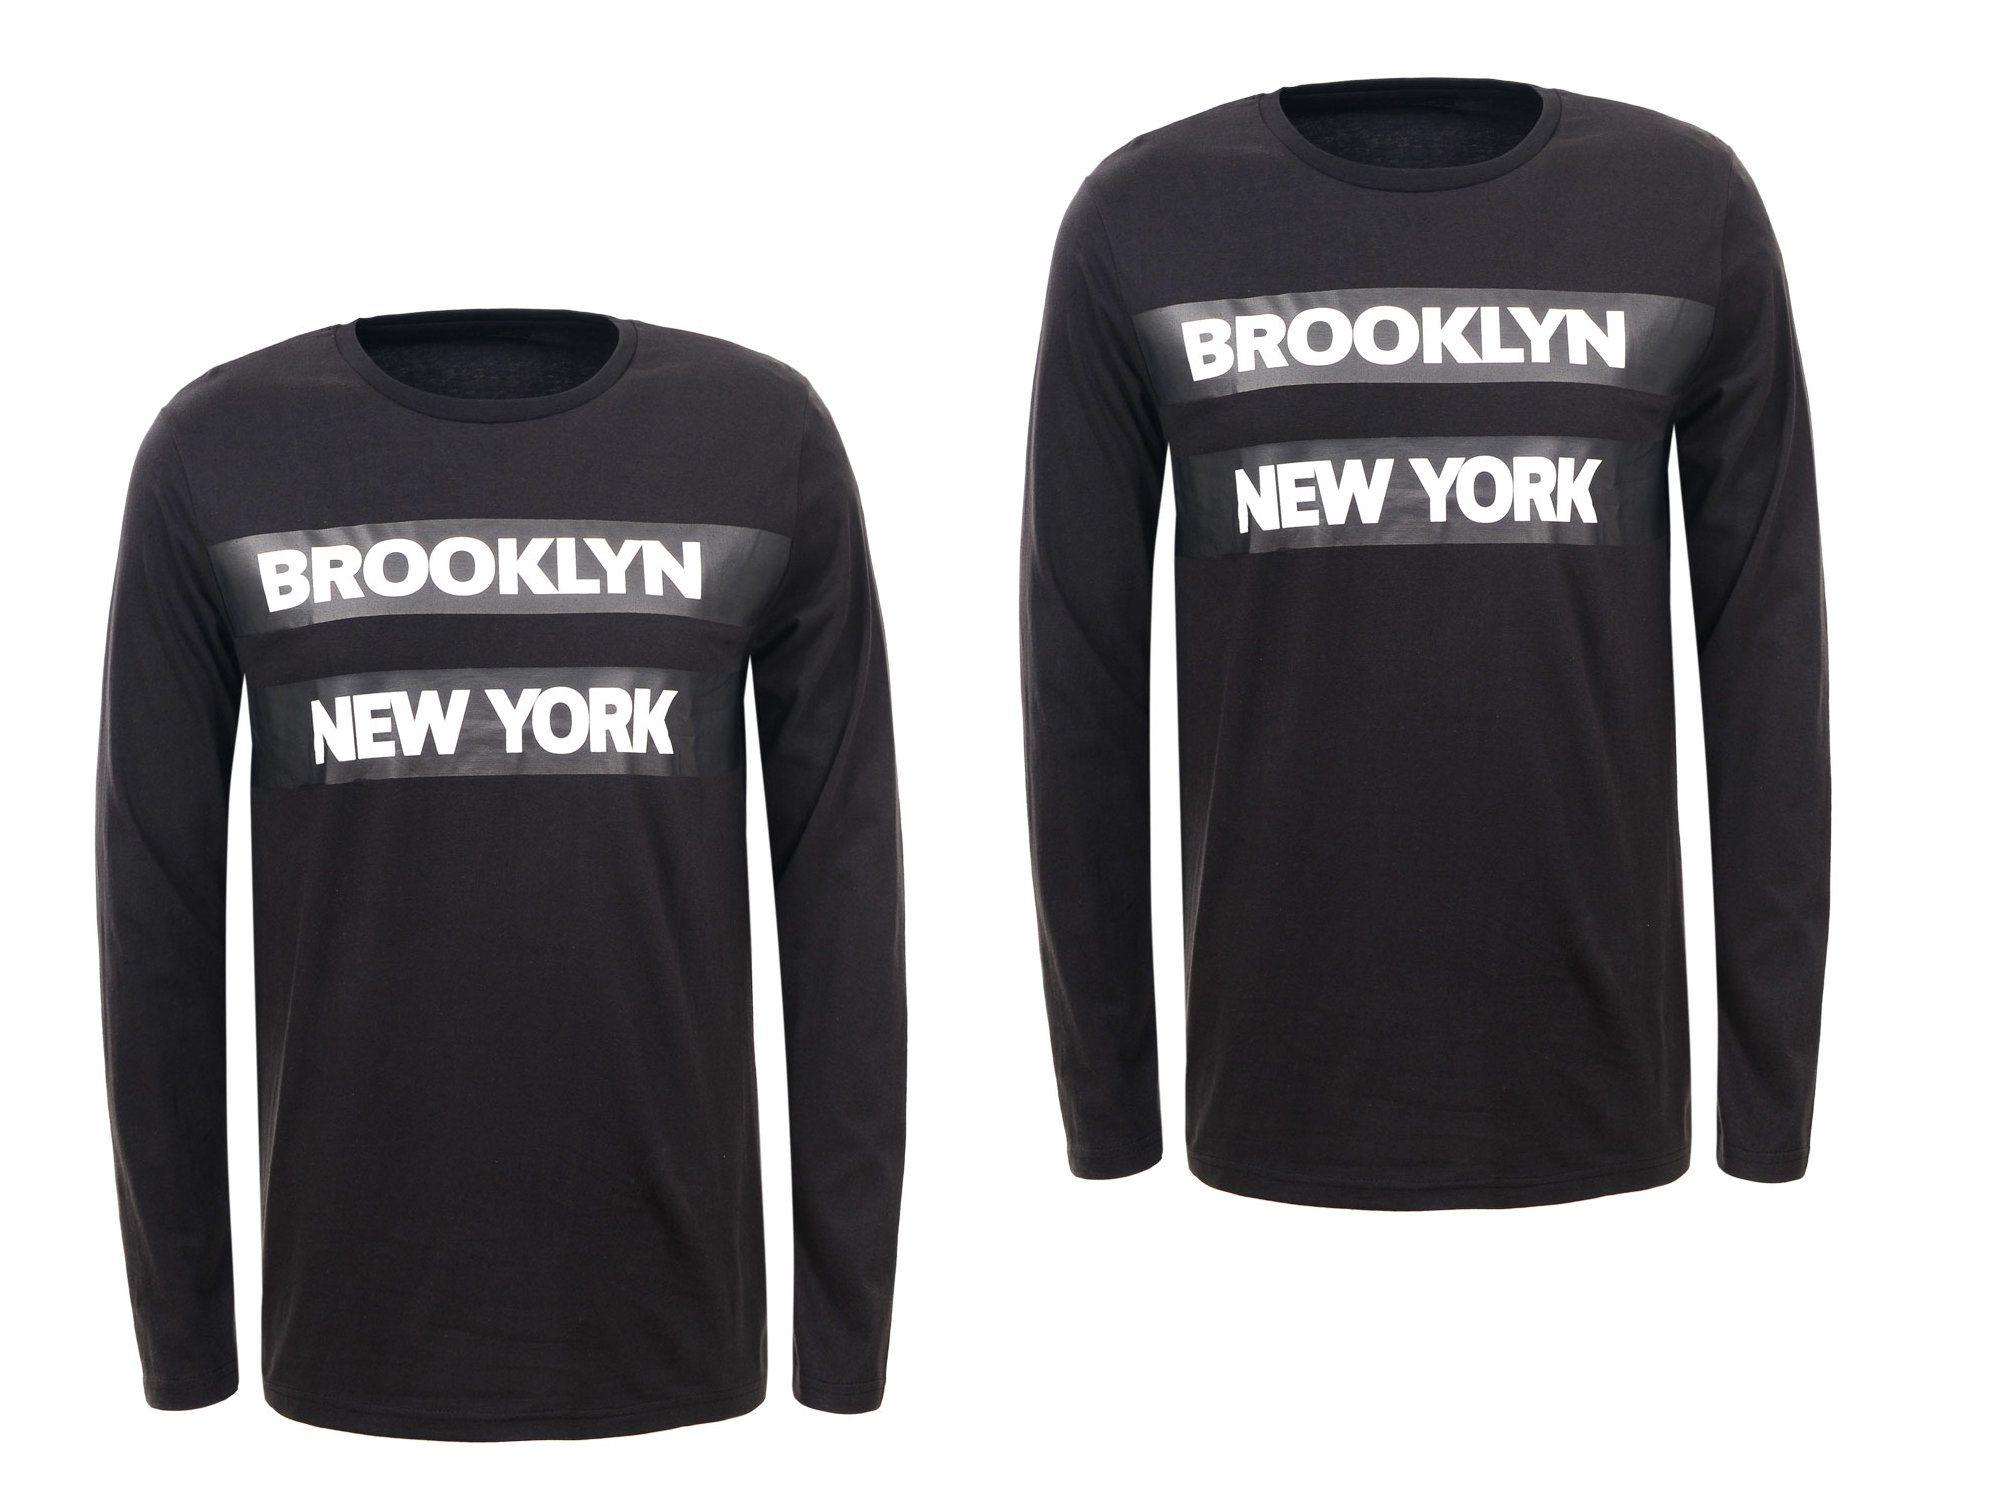 Longsleeve Bluzka Meska Z Dlugim Rekawem Bluza S 6936897708 Oficjalne Archiwum Allegro Brooklyn New York Fashion York